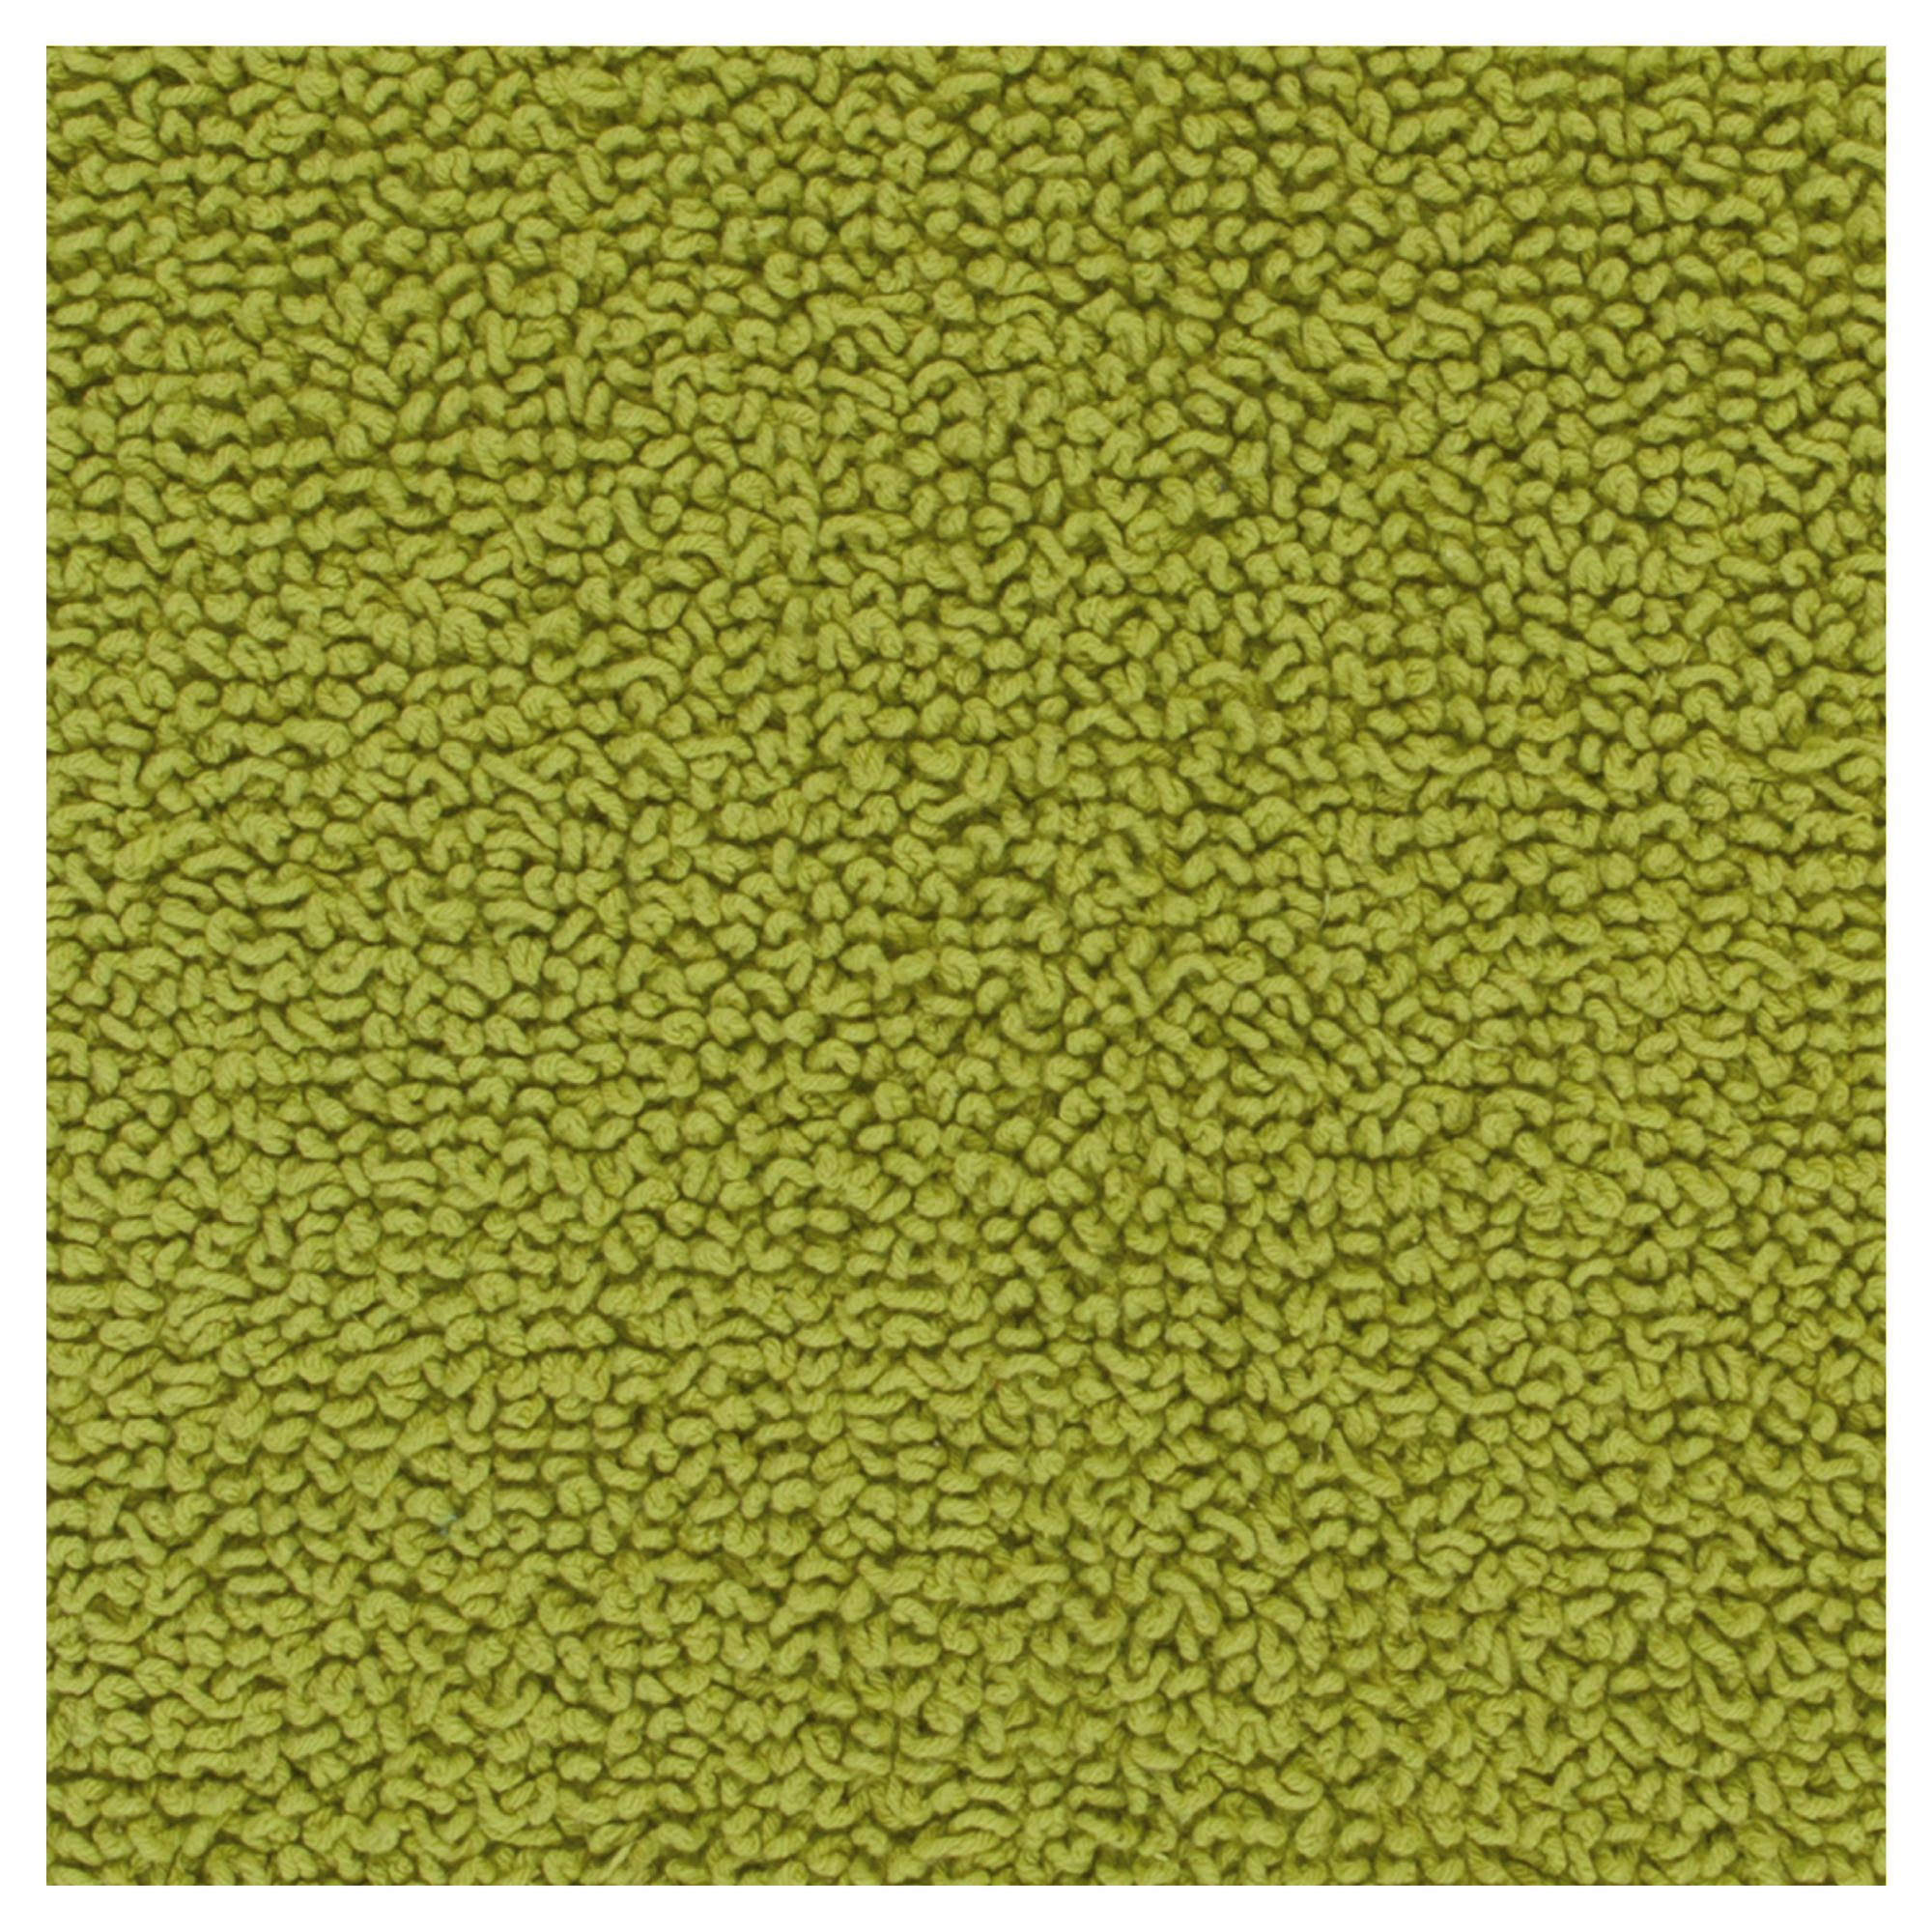 tesco direct tesco standard reversible bath mat lime. Black Bedroom Furniture Sets. Home Design Ideas